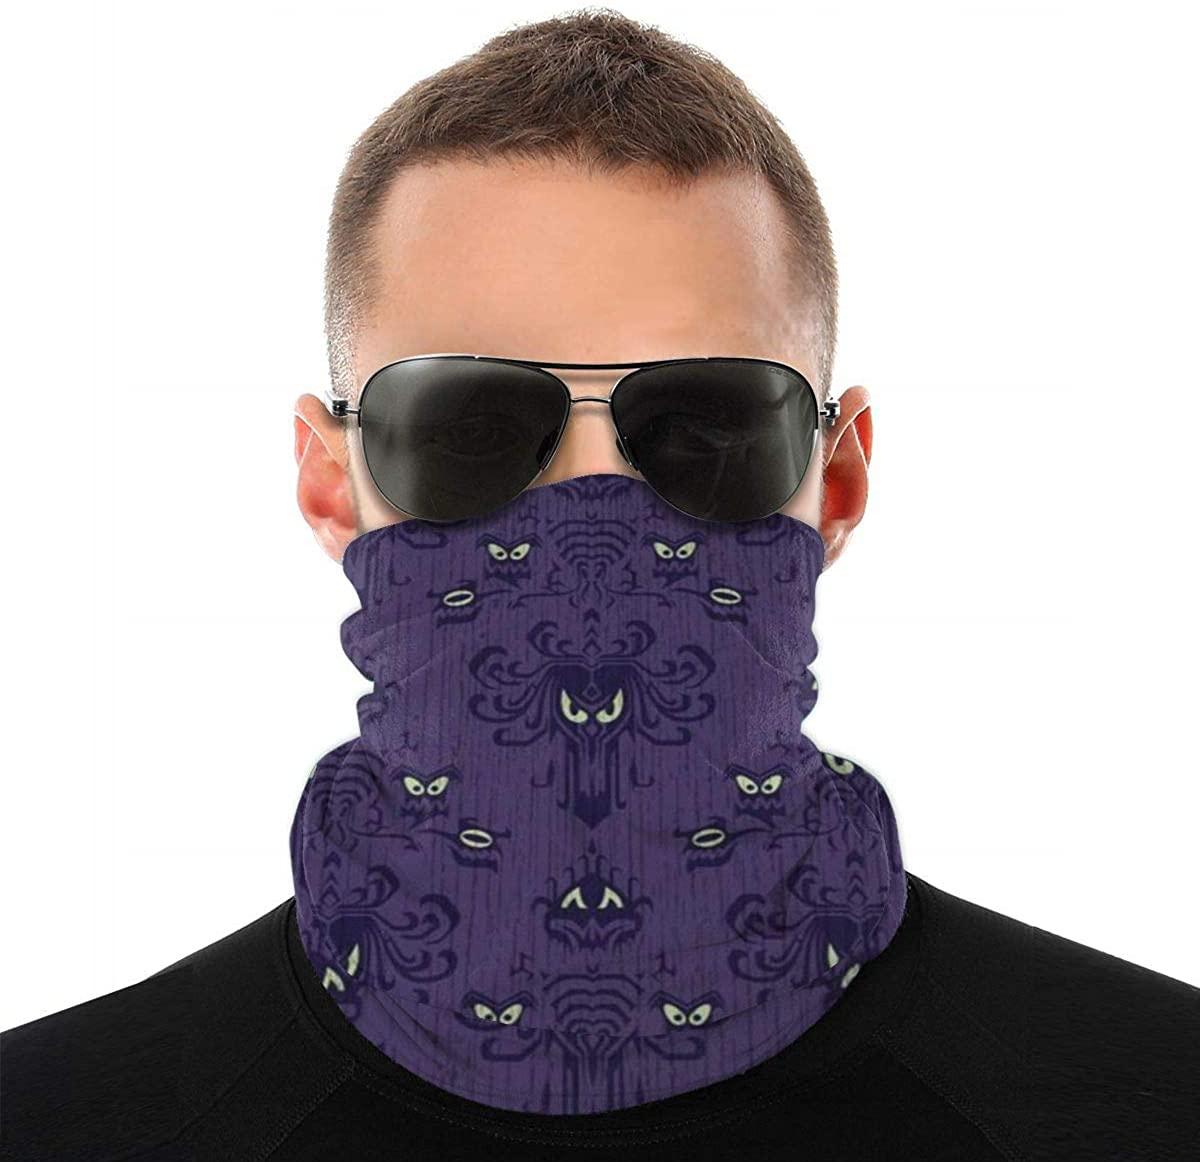 Neck Gaiter Bandana Face Mask Multifunctional Headwear for Men Women